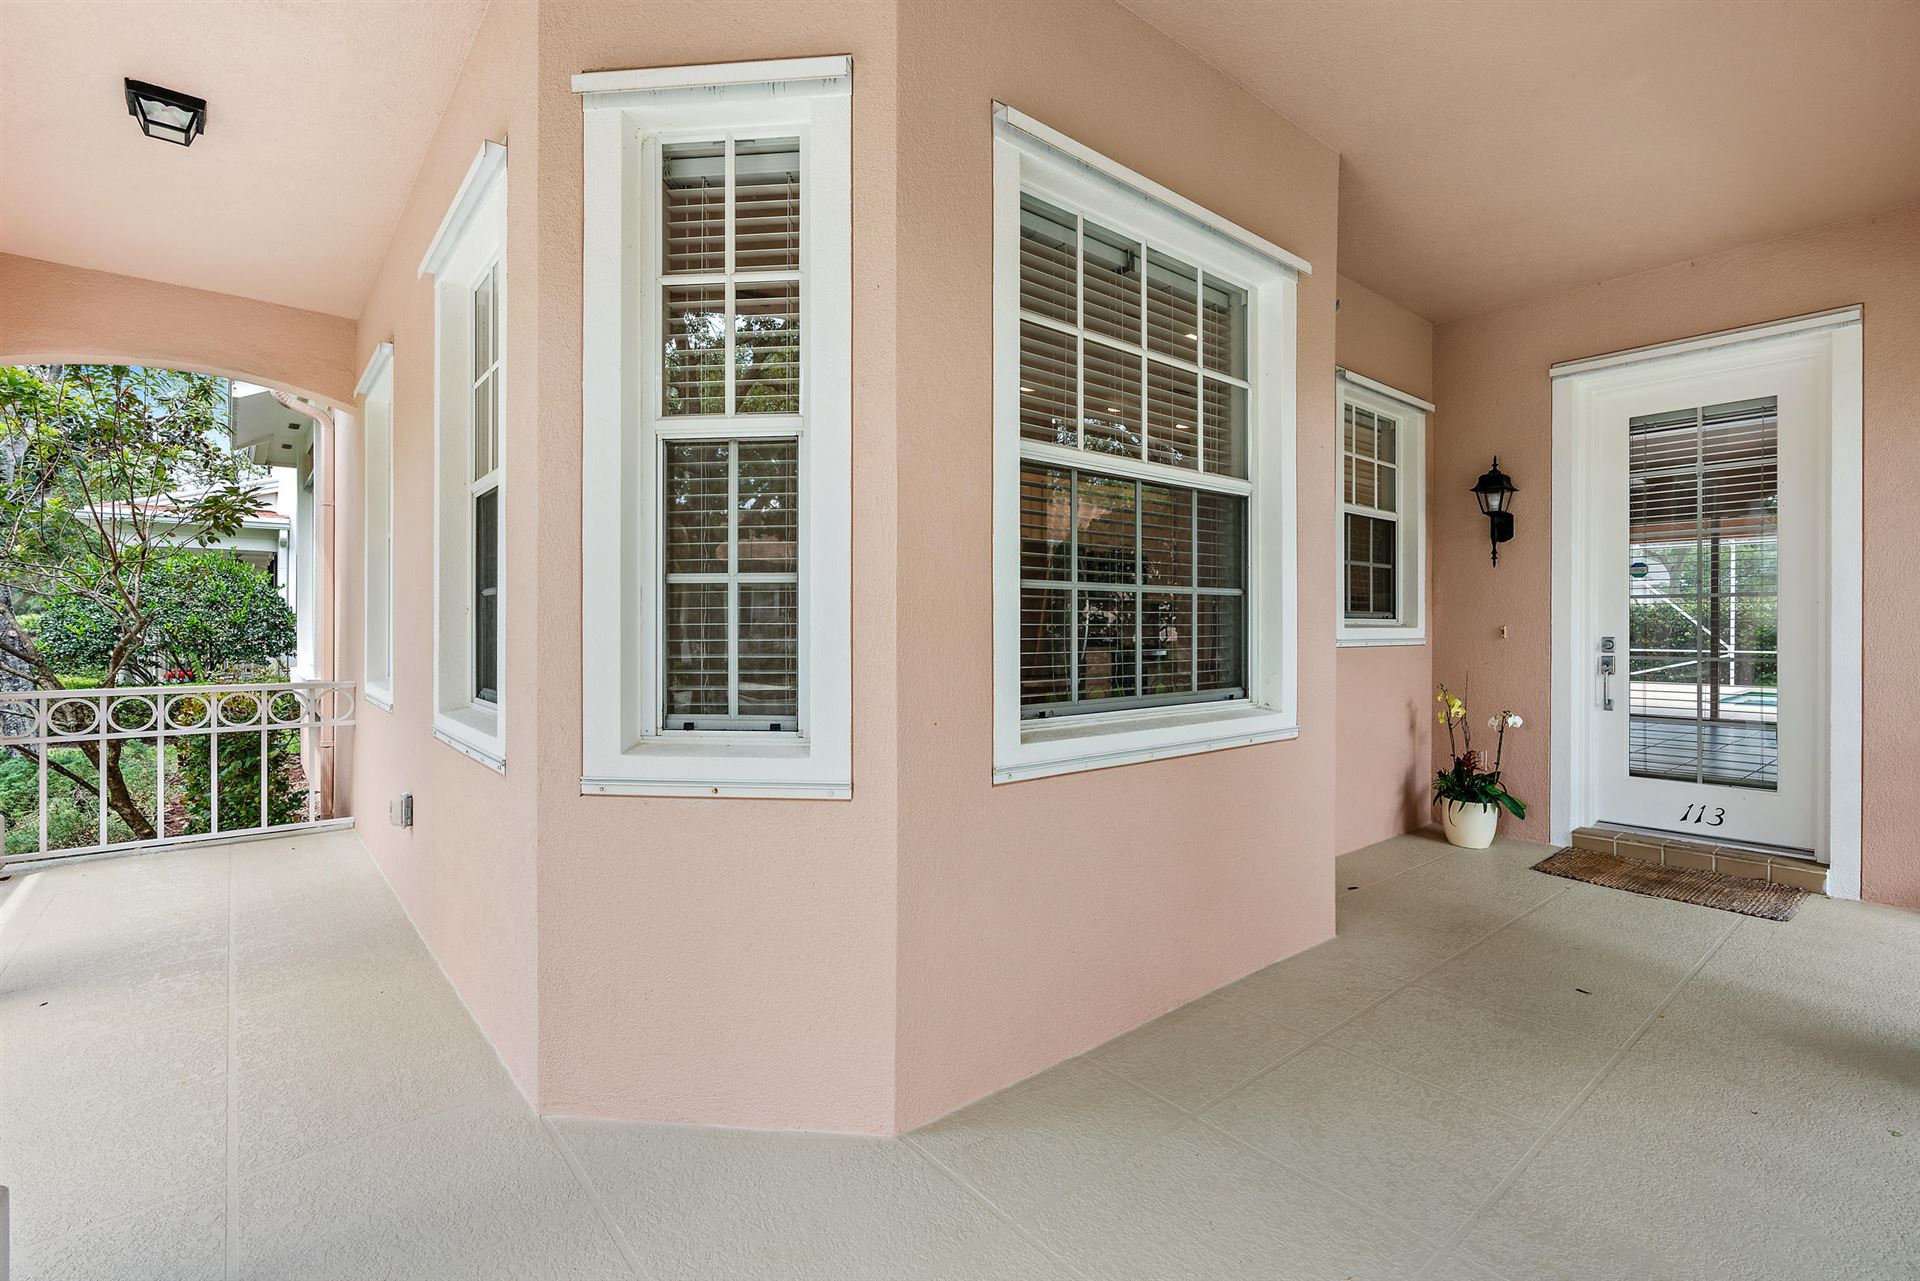 Photo of 113 Rockingham Road, Jupiter, FL 33458 (MLS # RX-10709855)